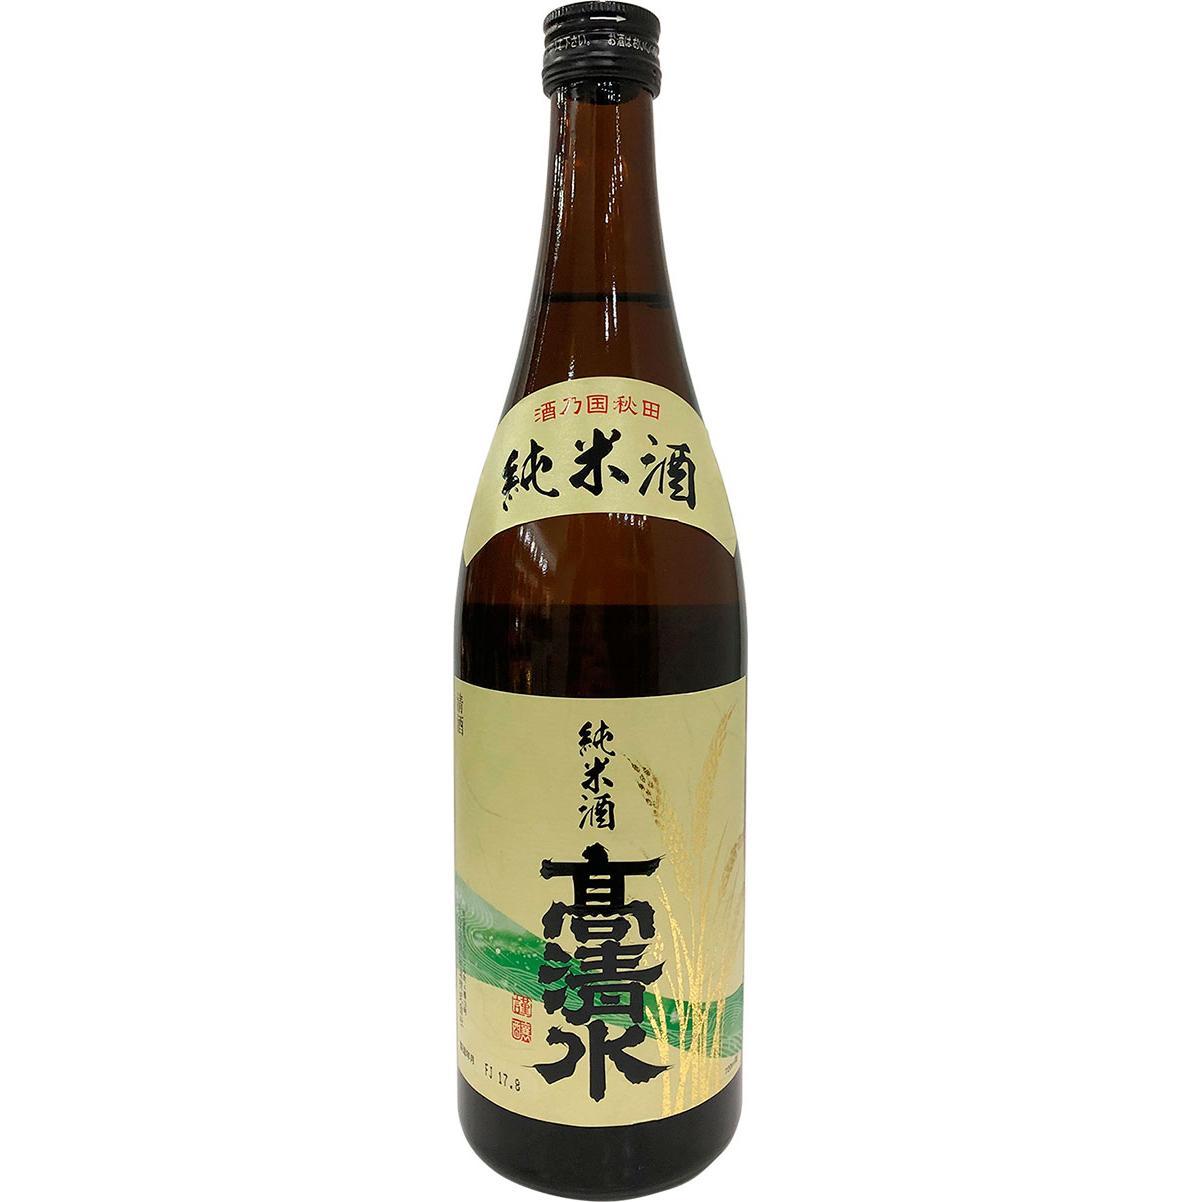 Takashimizu Junmai Sake 0,72l